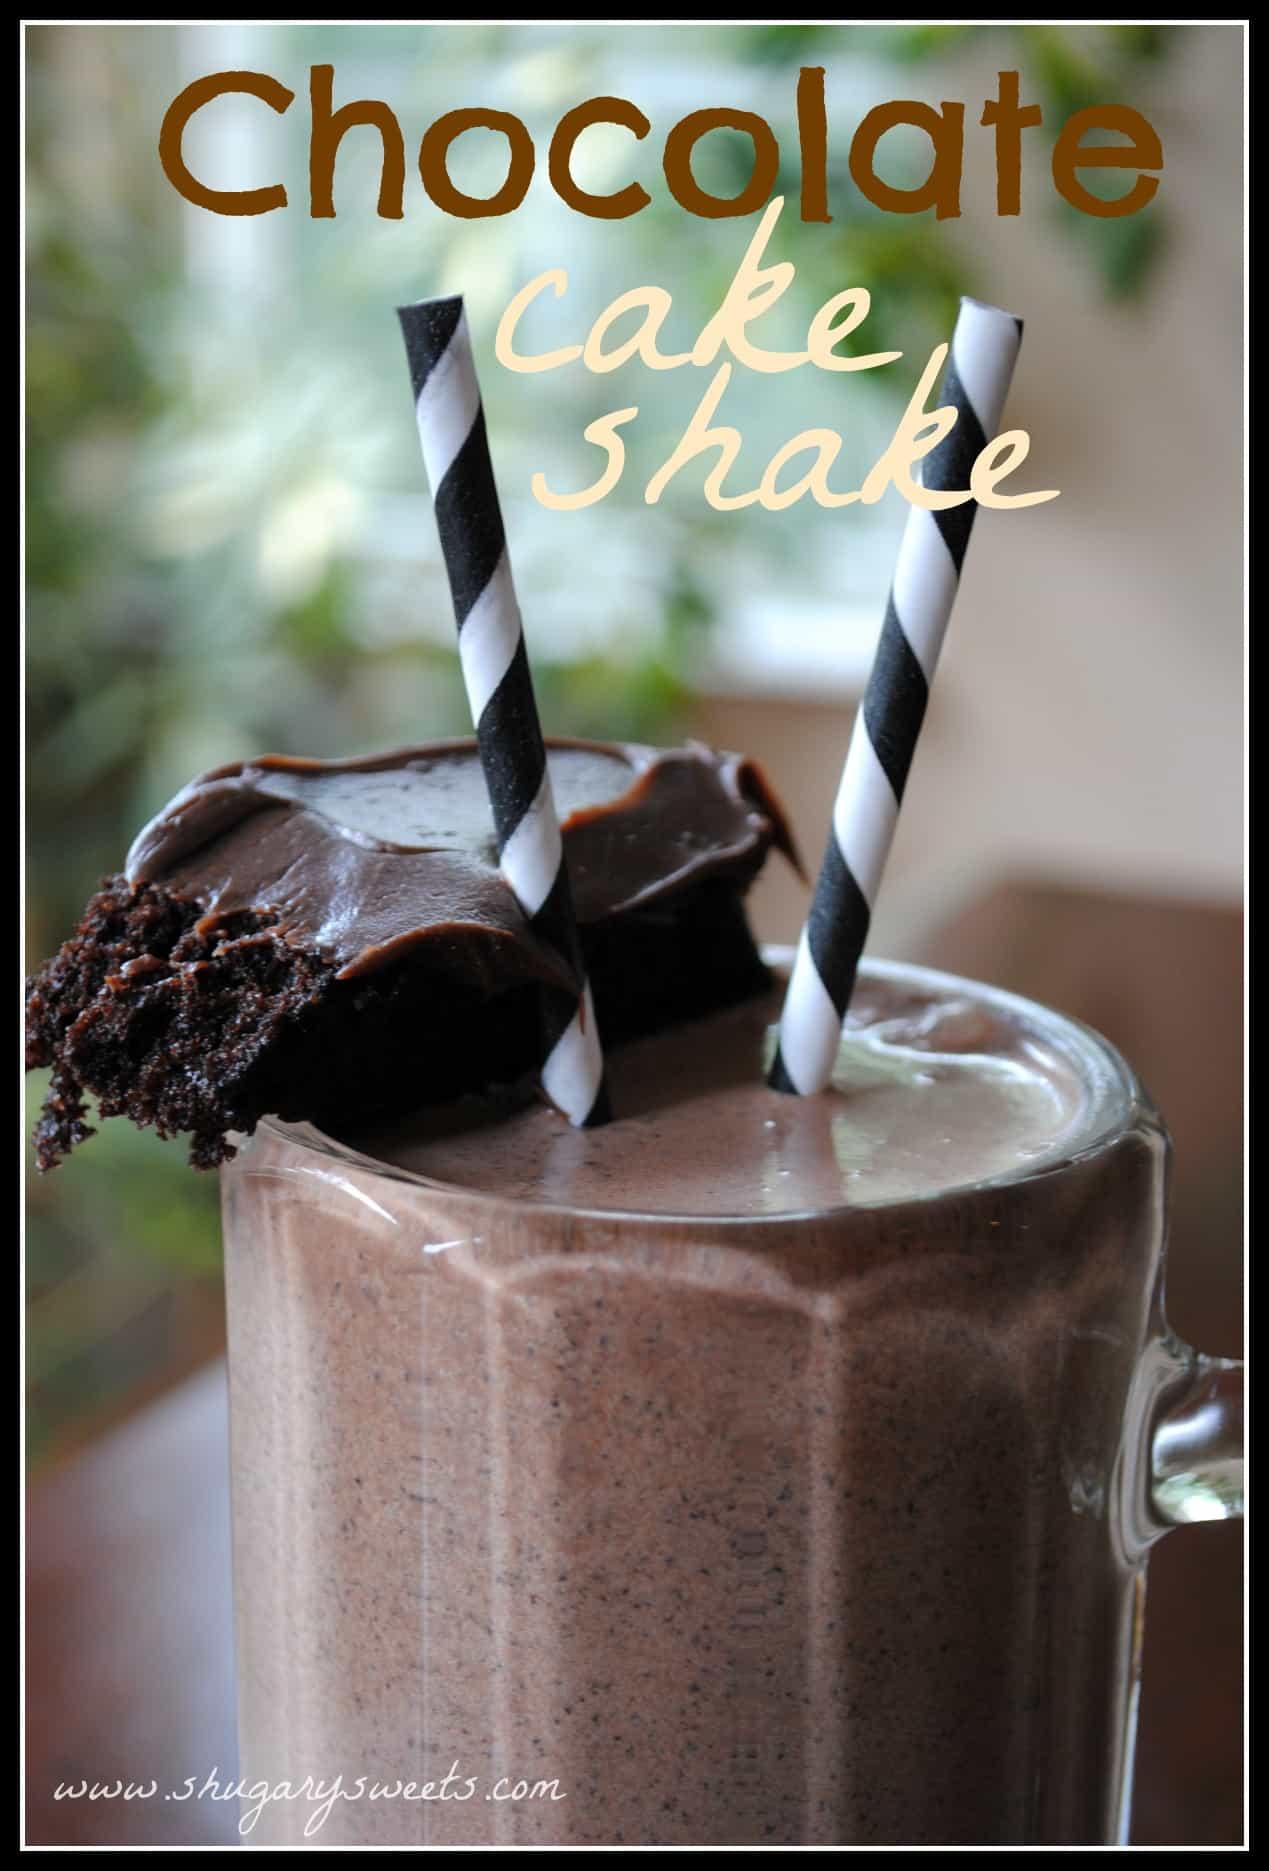 Chocolate Cake Shake - Shugary Sweets